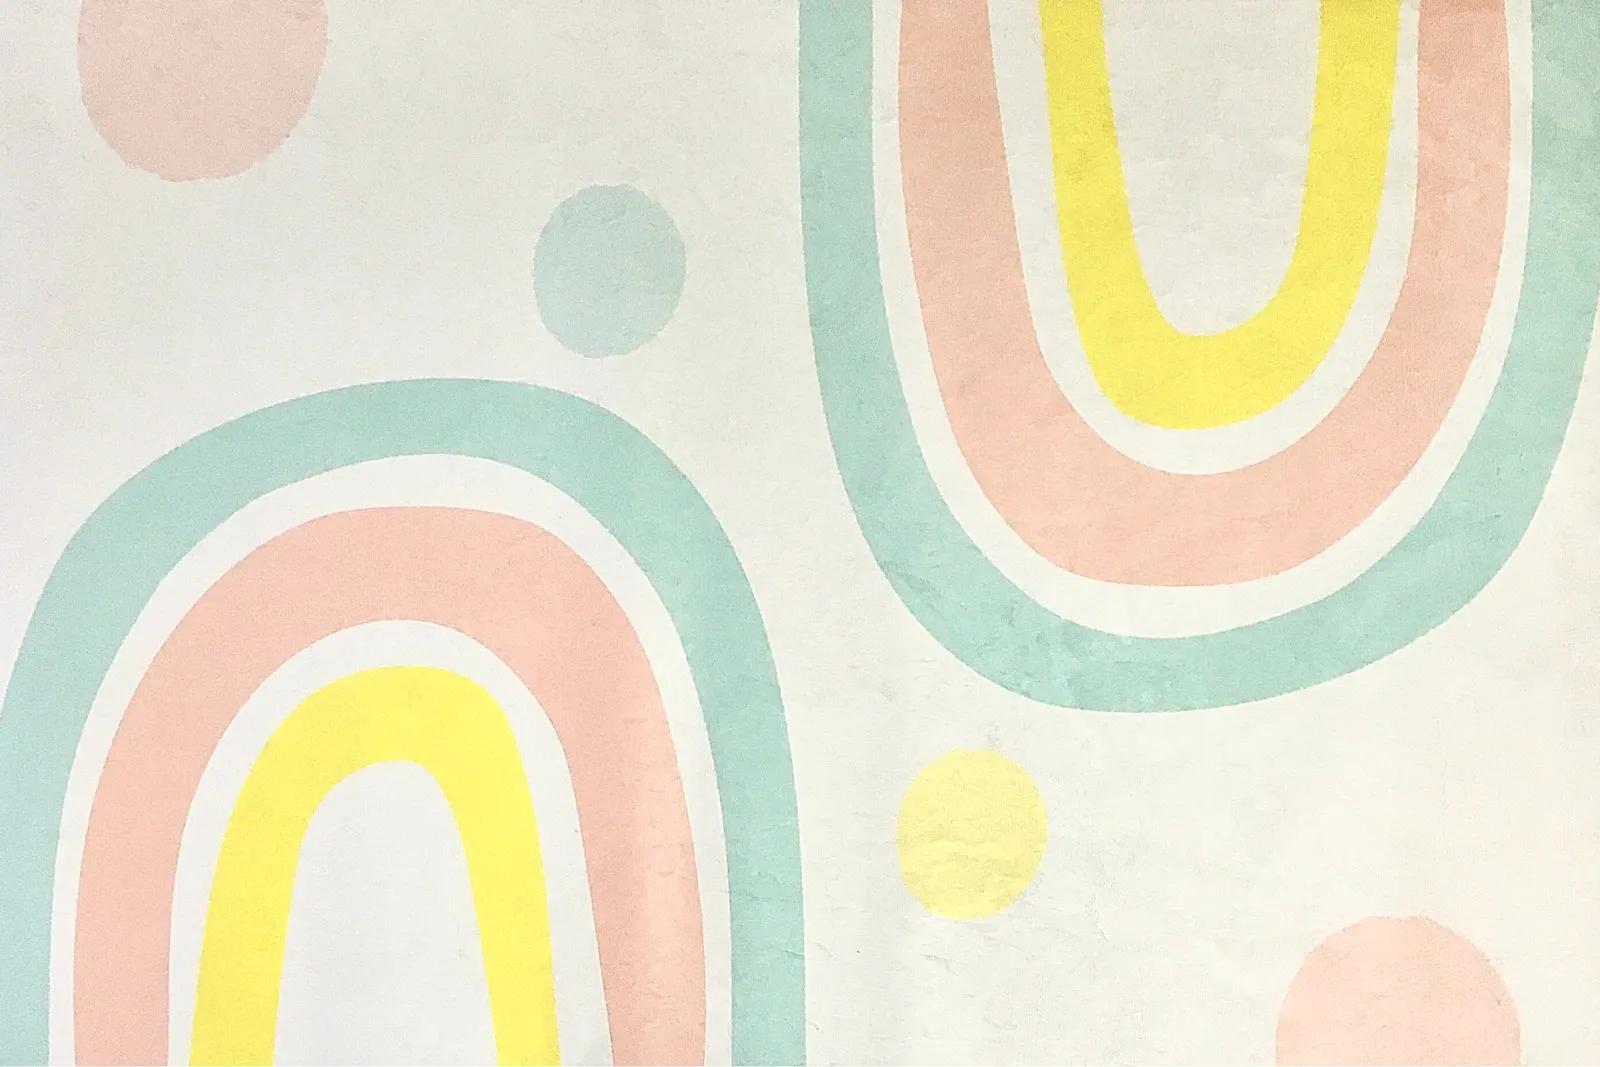 Tapete quarto infantil 100 x 150 cm estampa Arco Íris Candy  - Pomelo Decor